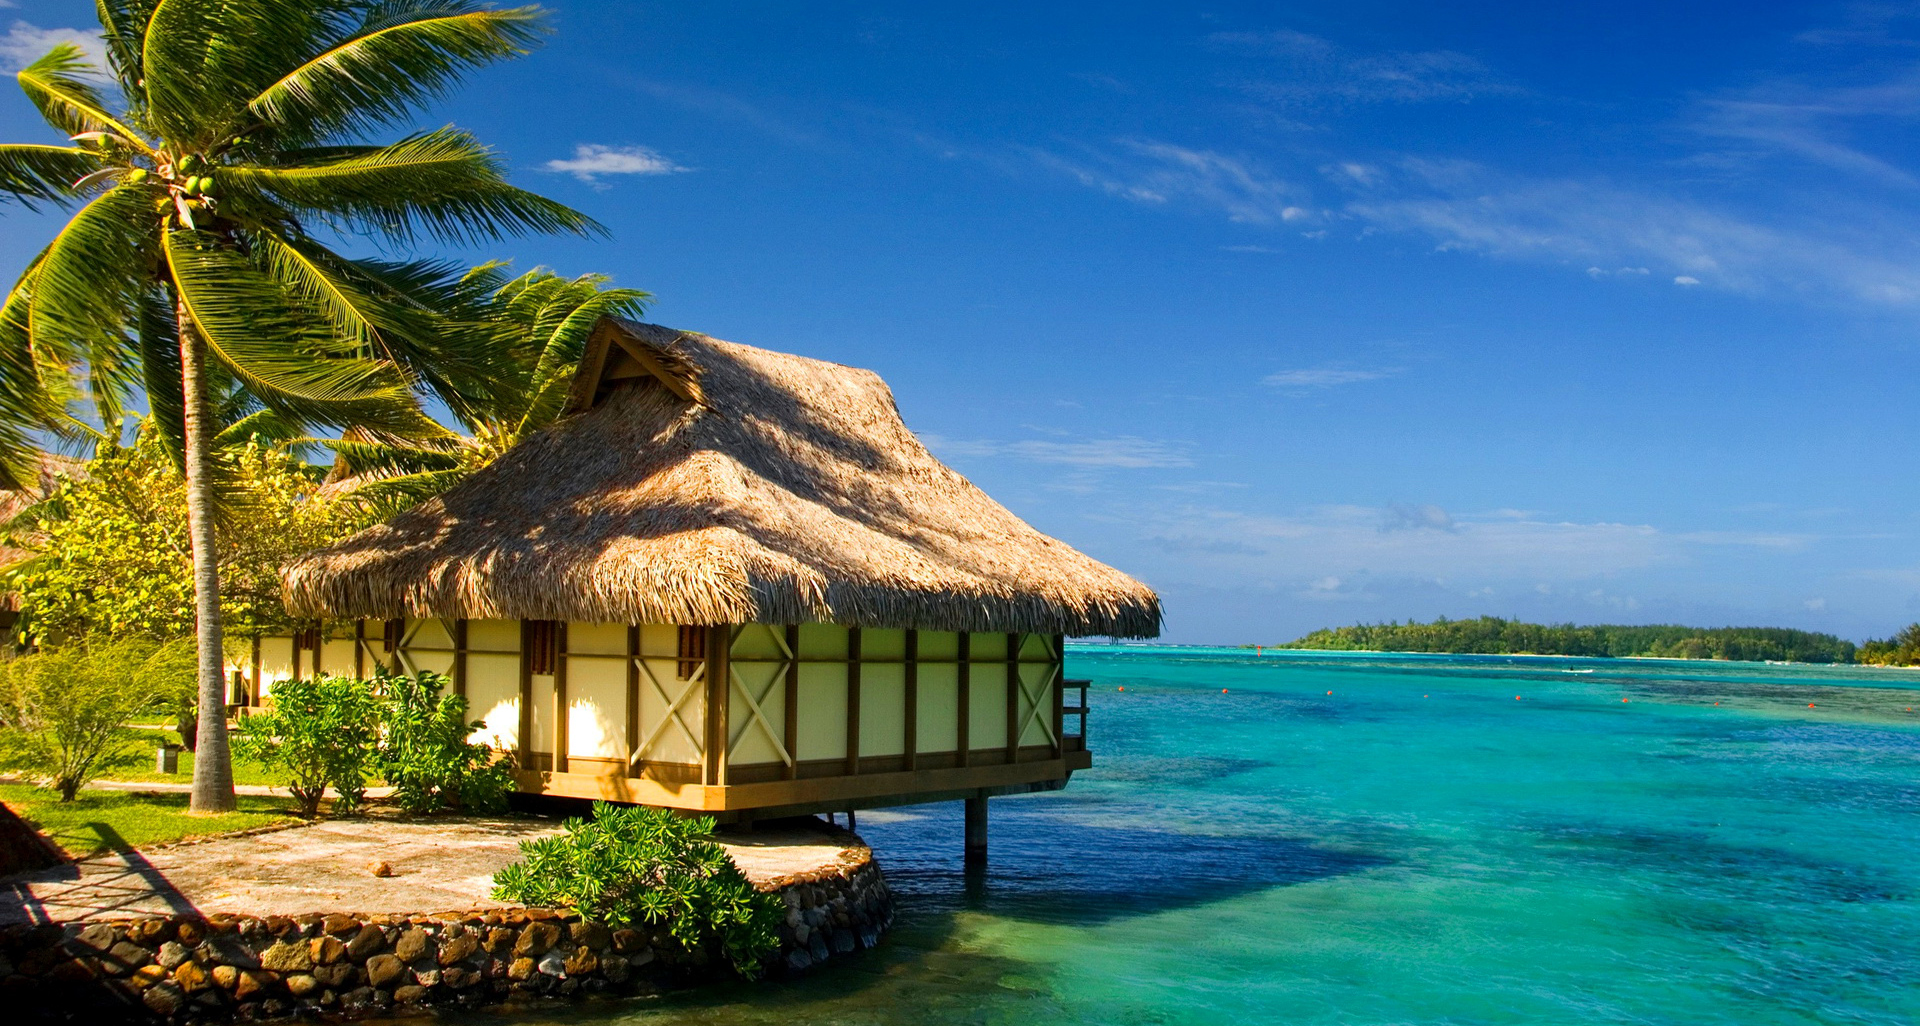 natural images hd wallpaper desktop background,tropics,resort,caribbean,property,vacation